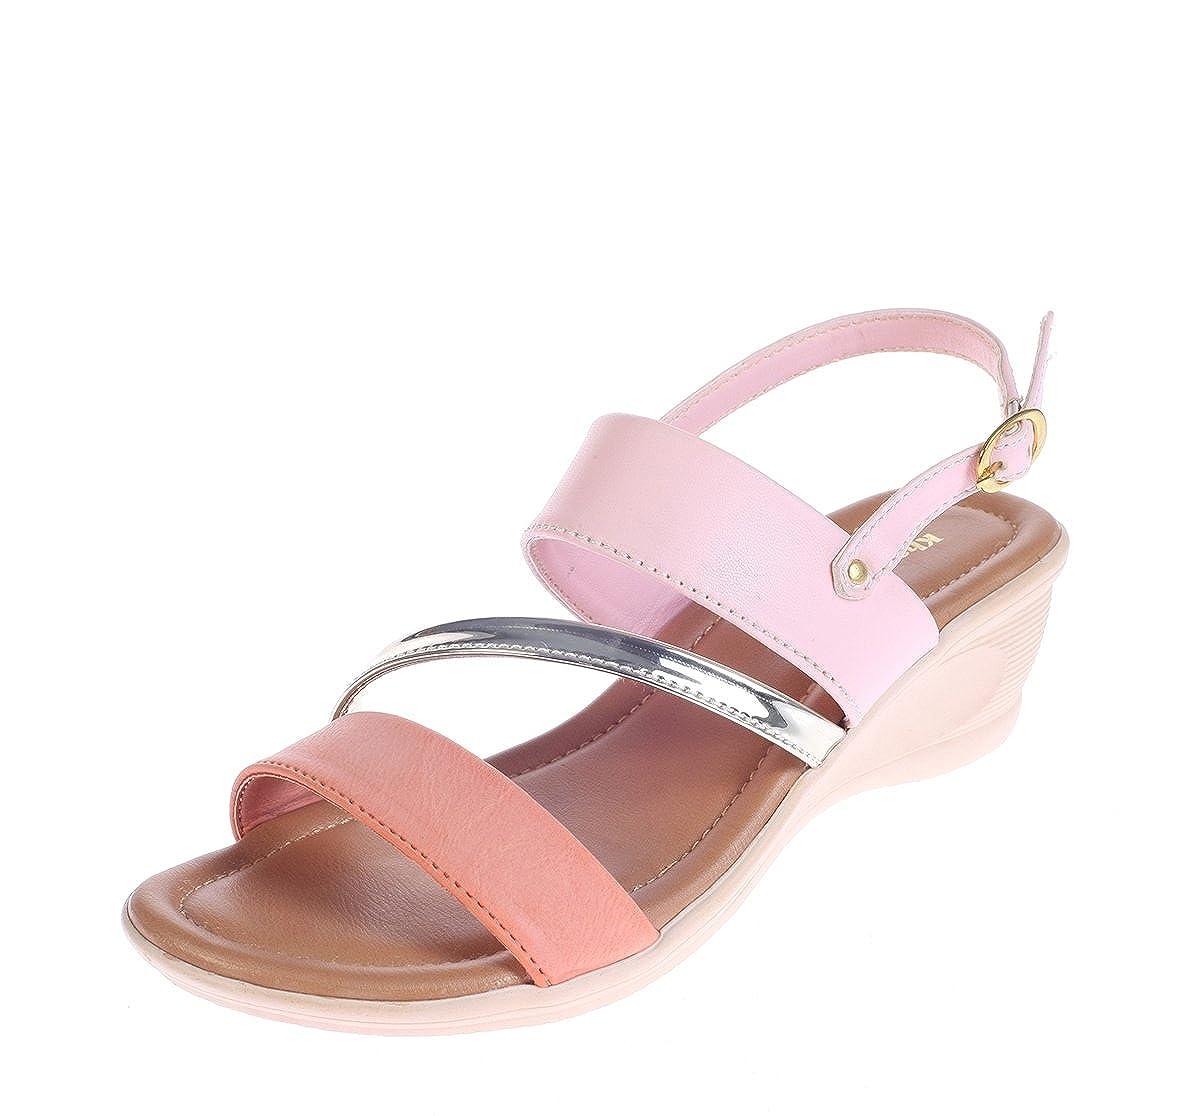 Khadims Womens Faux Leather Heels: Buy